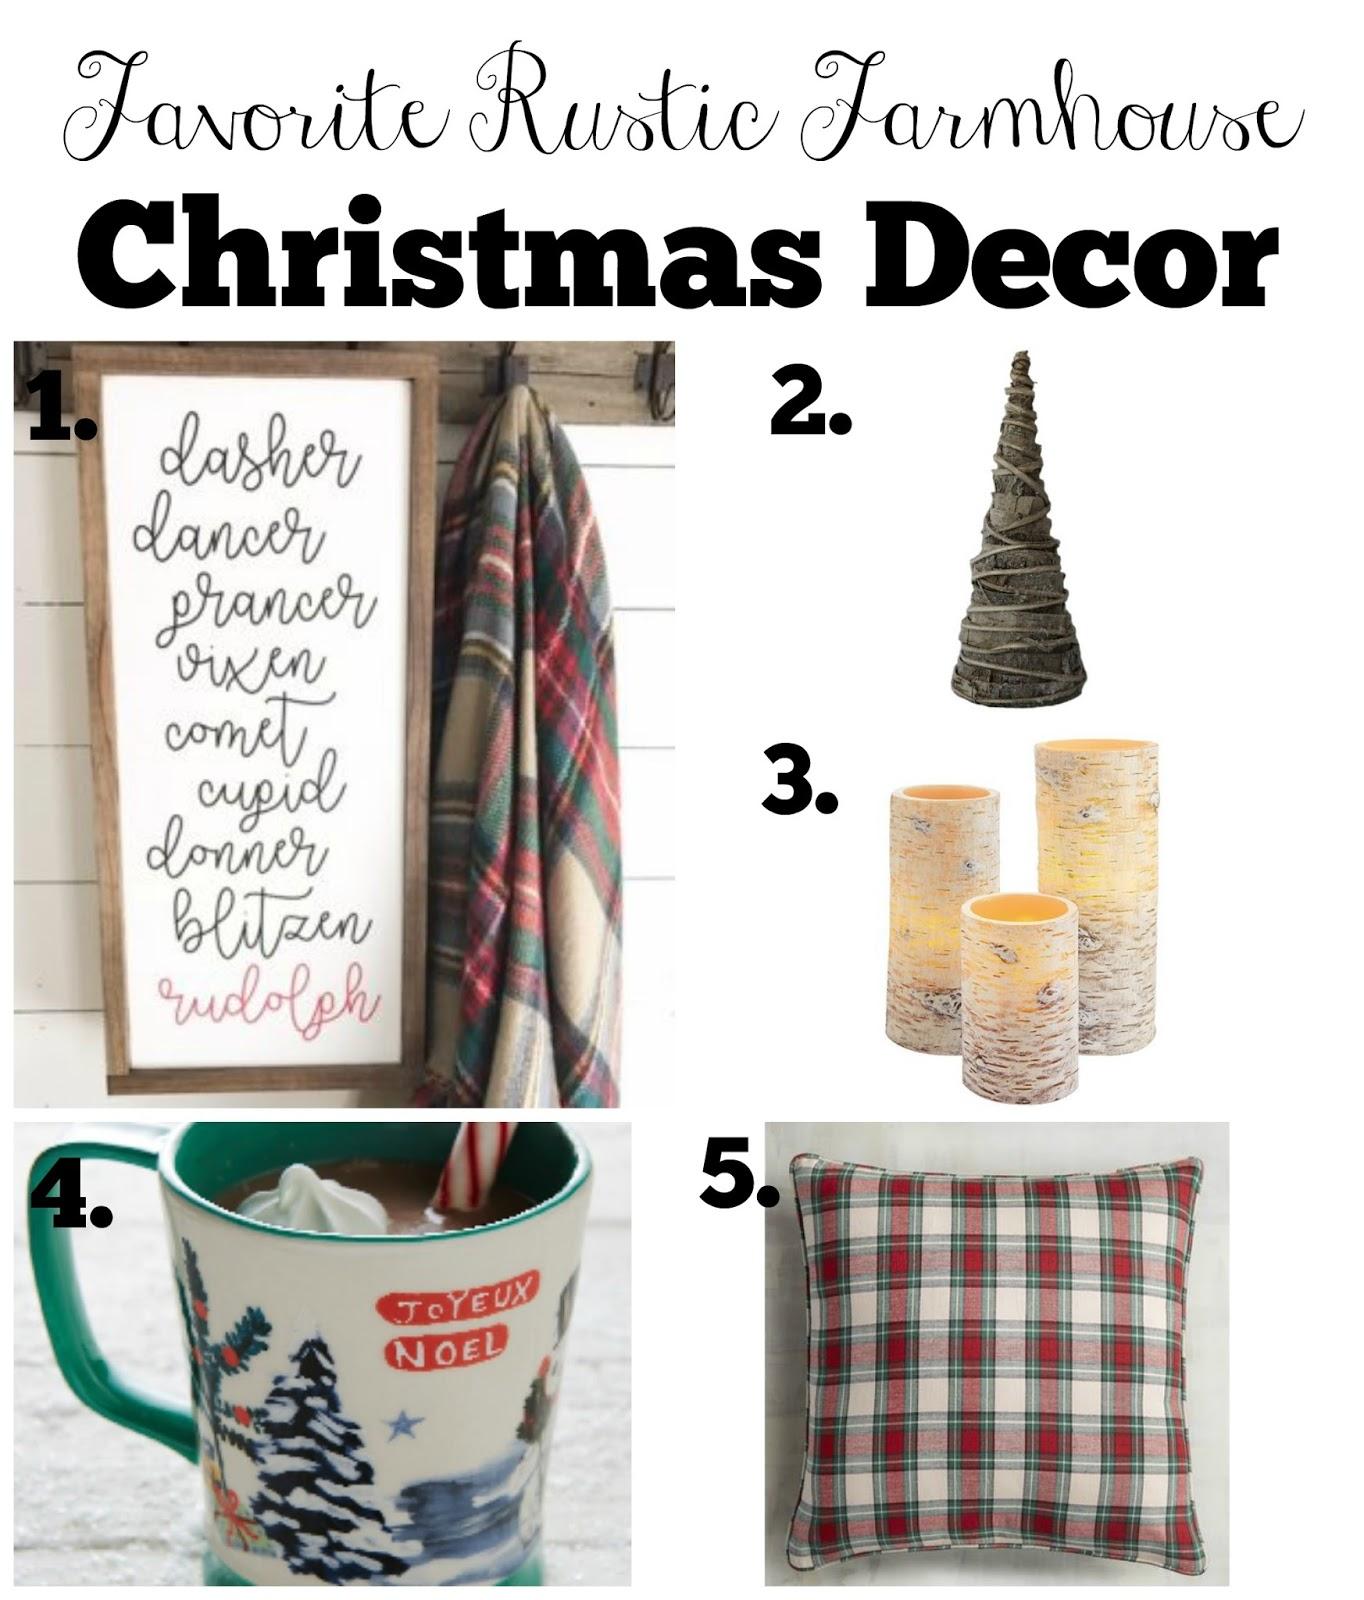 Favorite Rustic Farmhouse Christmas Decor - The Glam Farmhouse